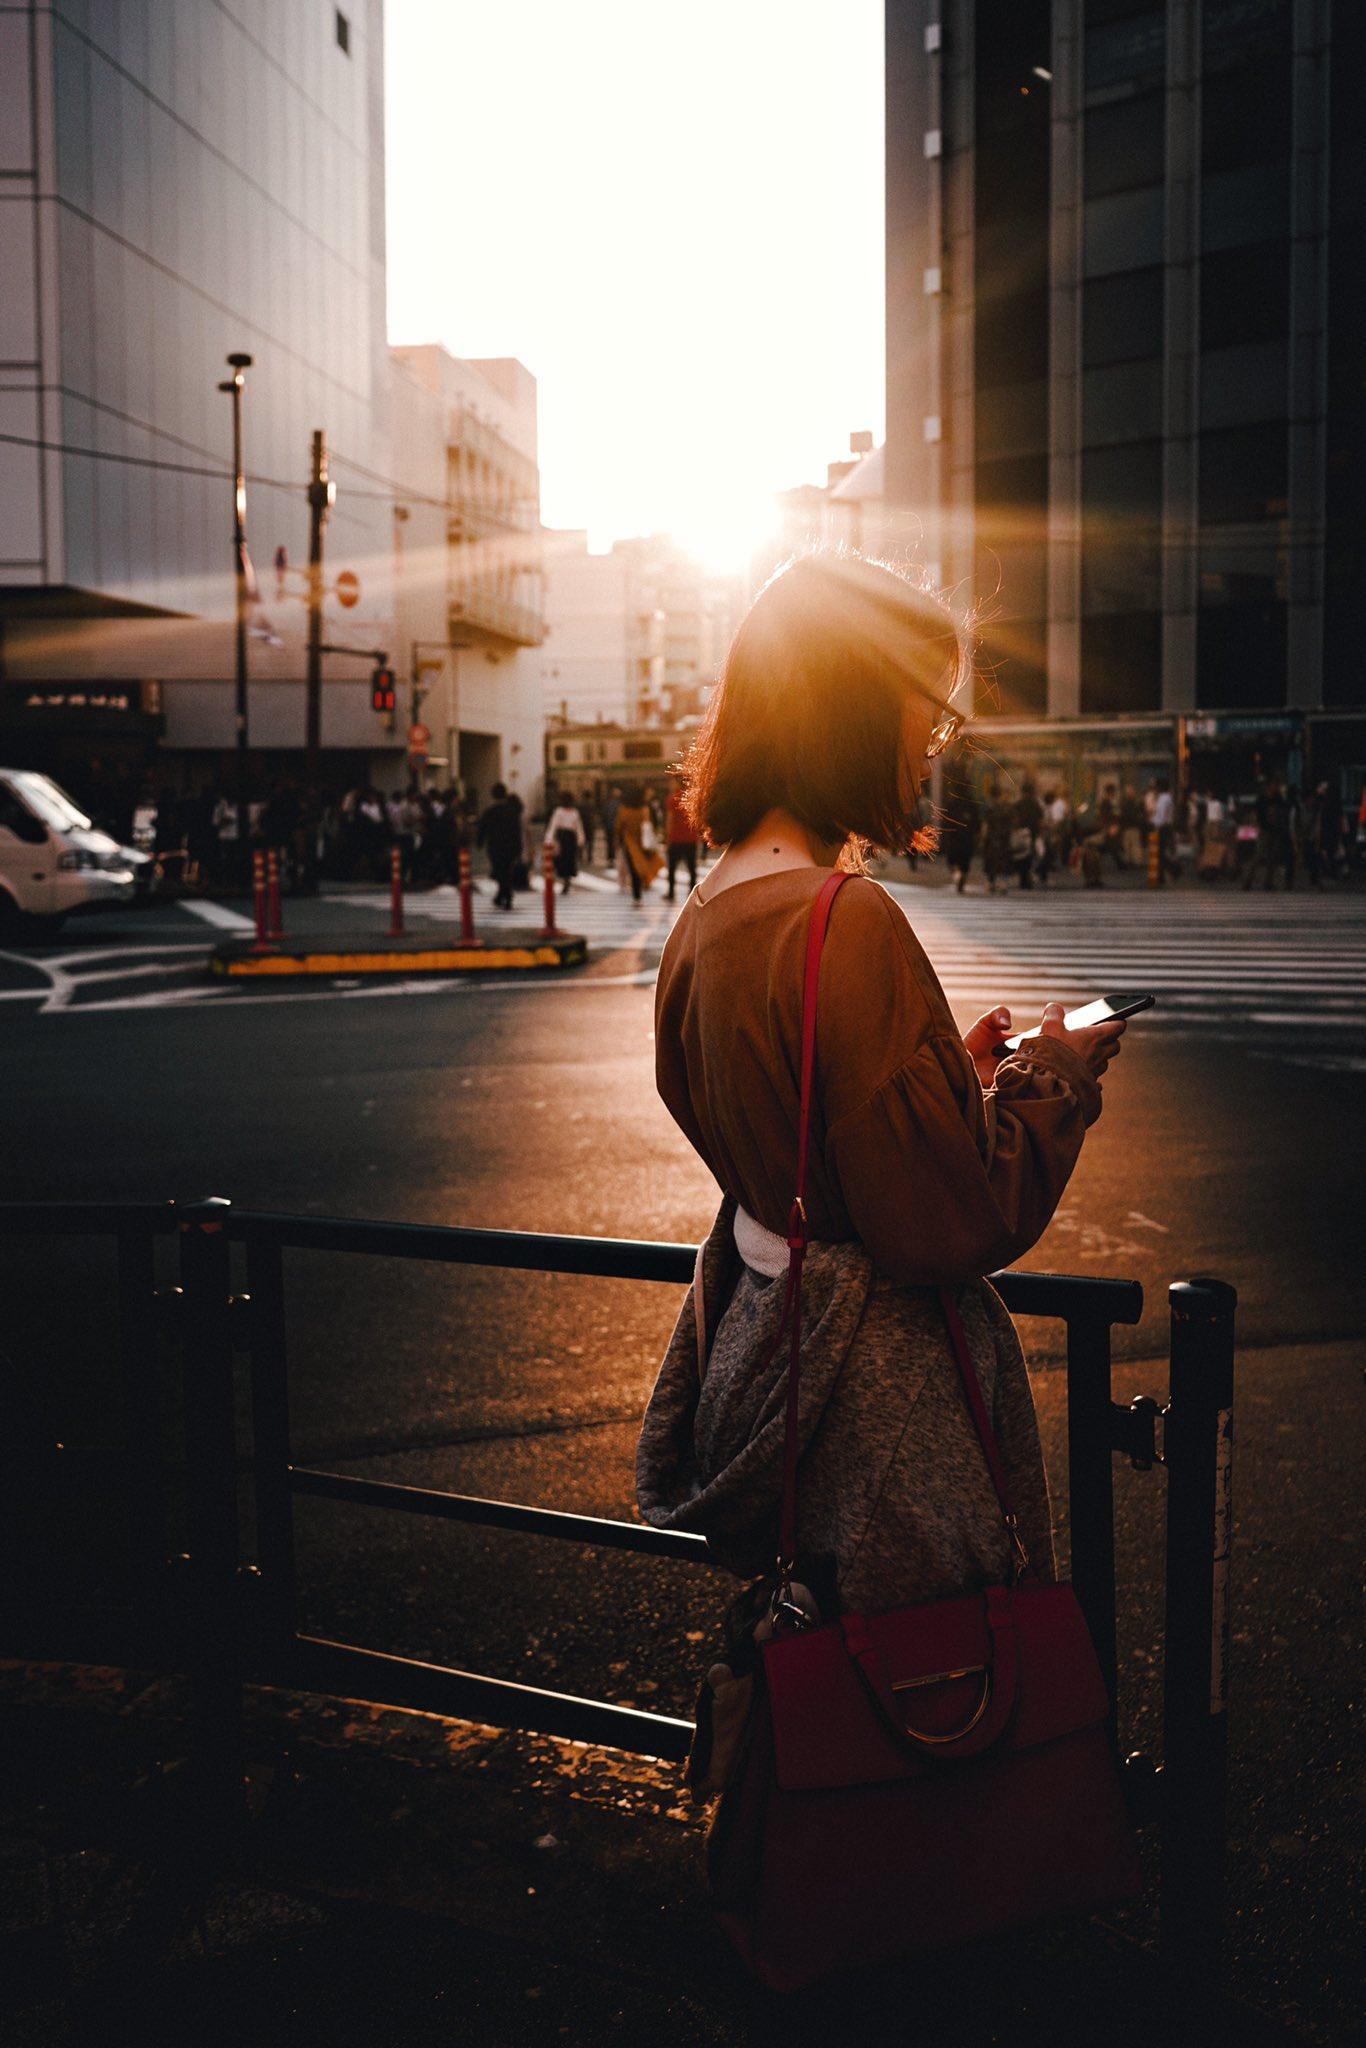 street_photography_22.jpg